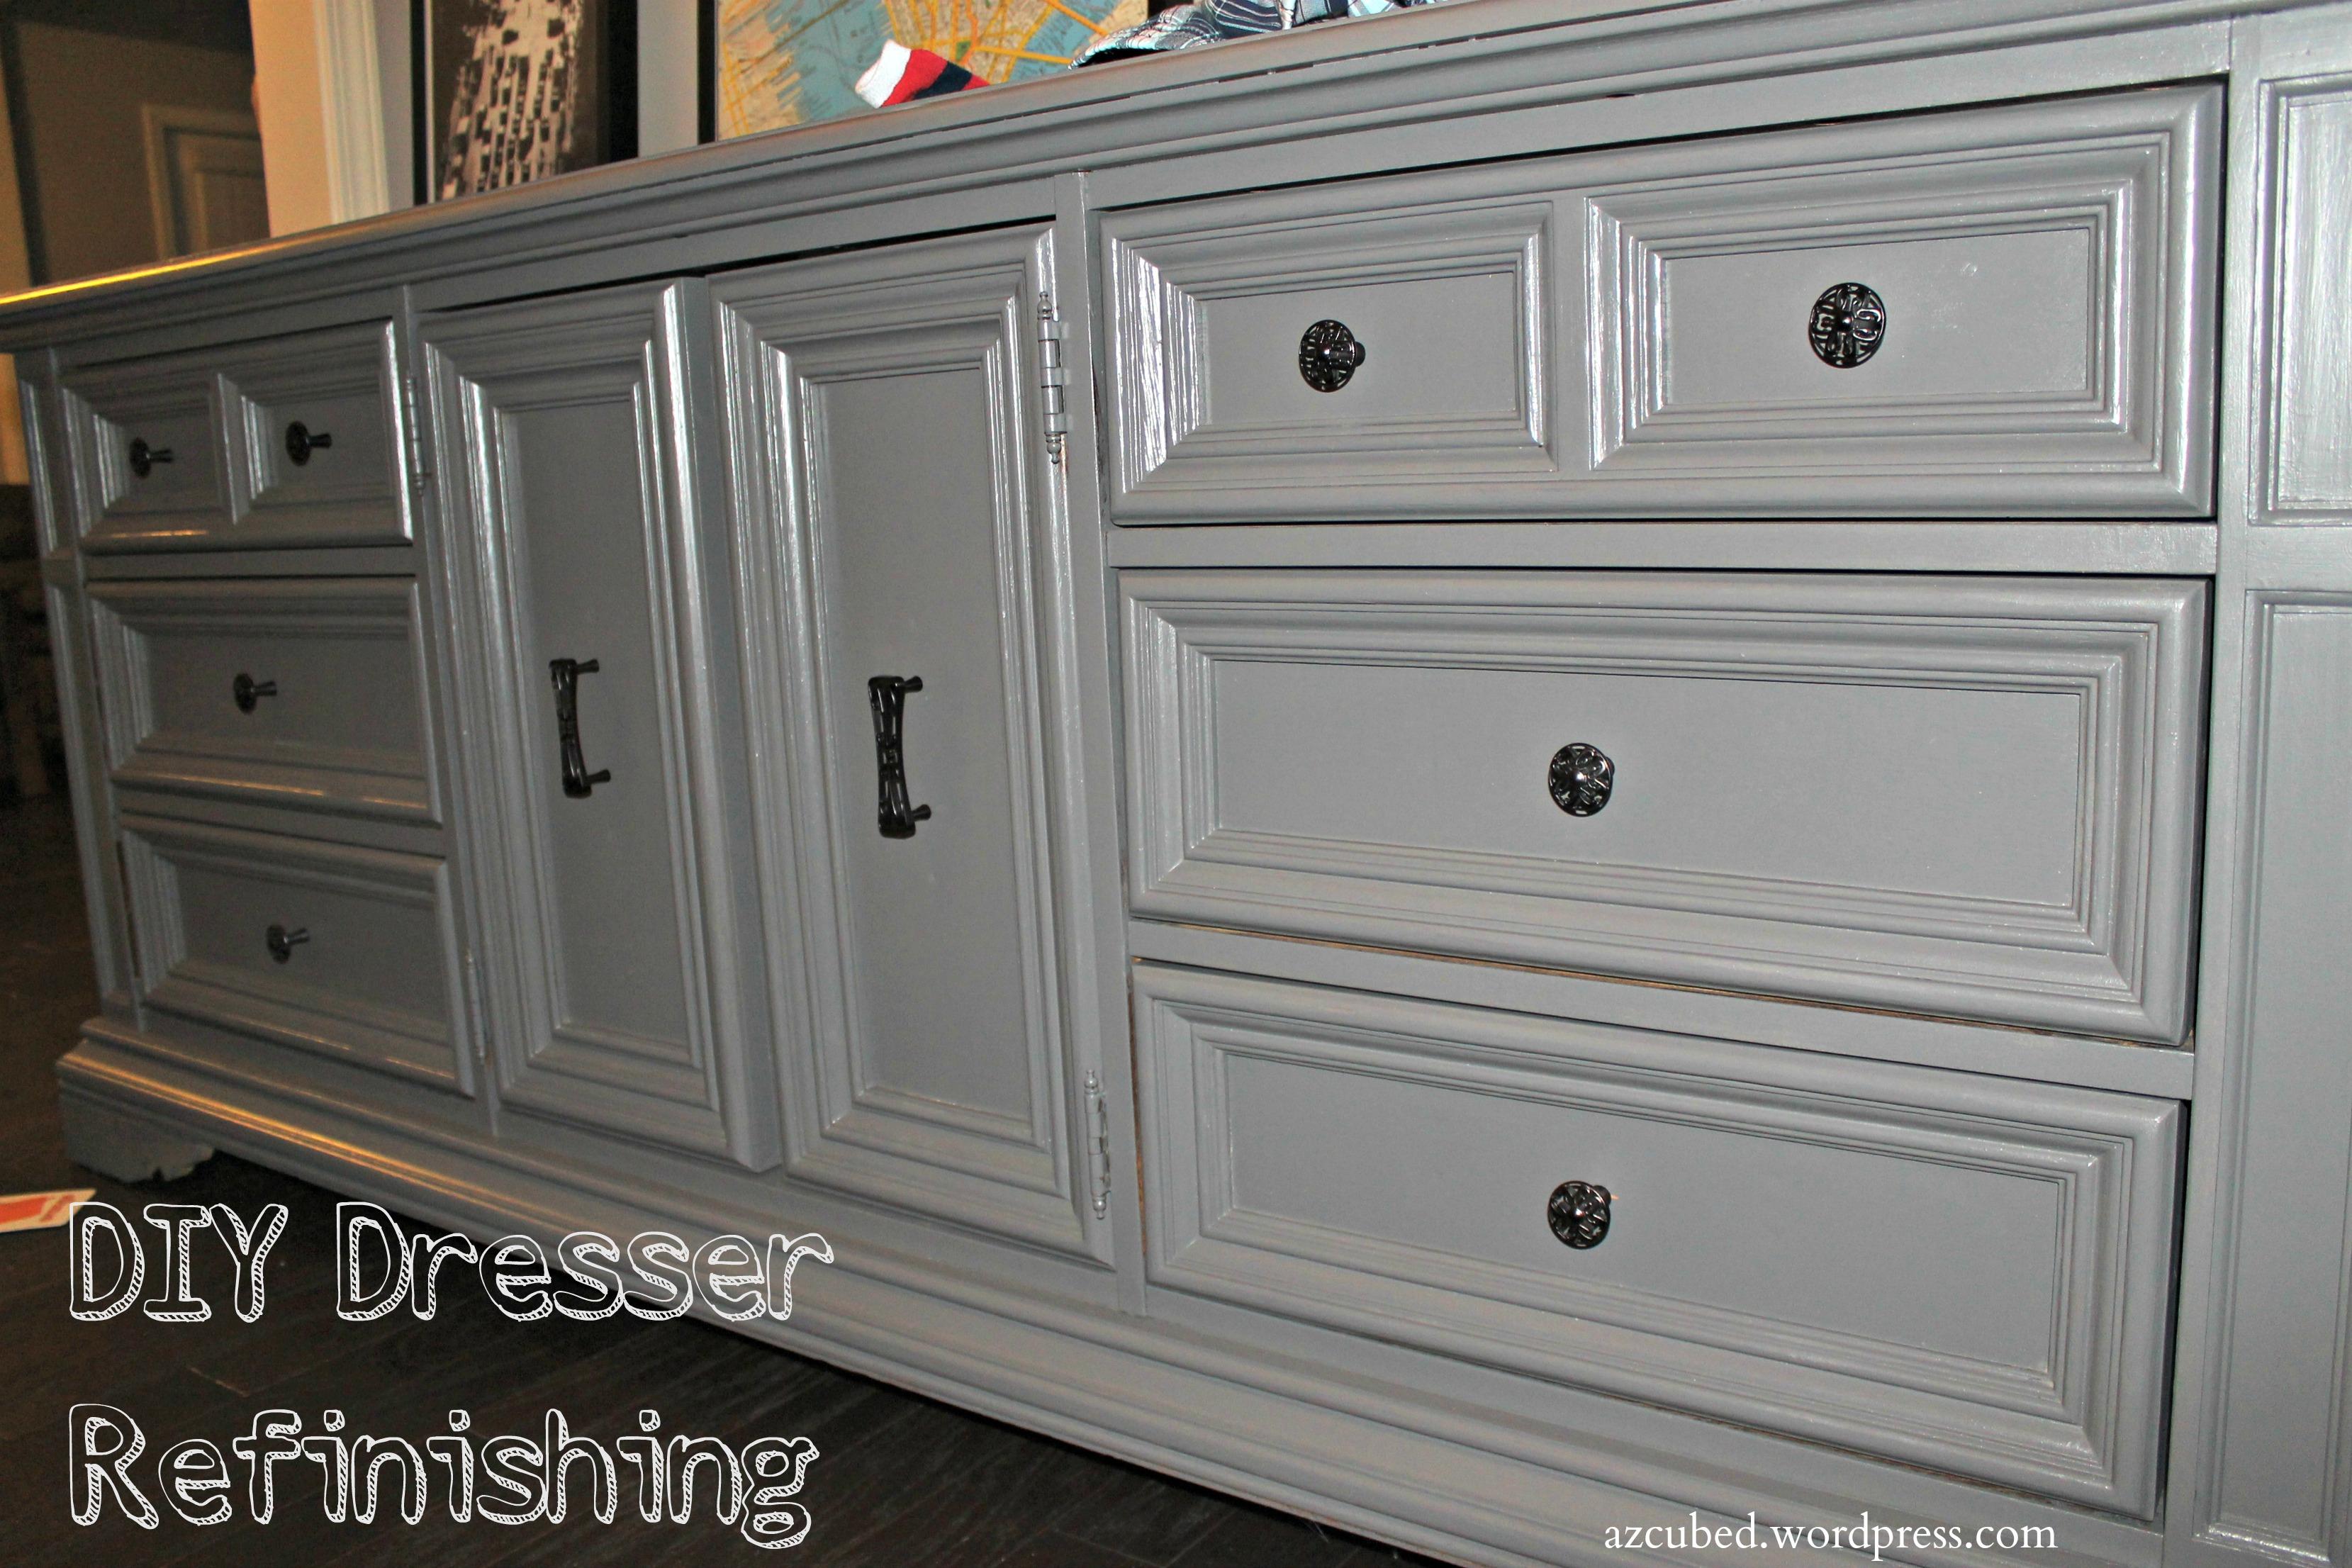 diy dresser refinishing! • domestic superhero